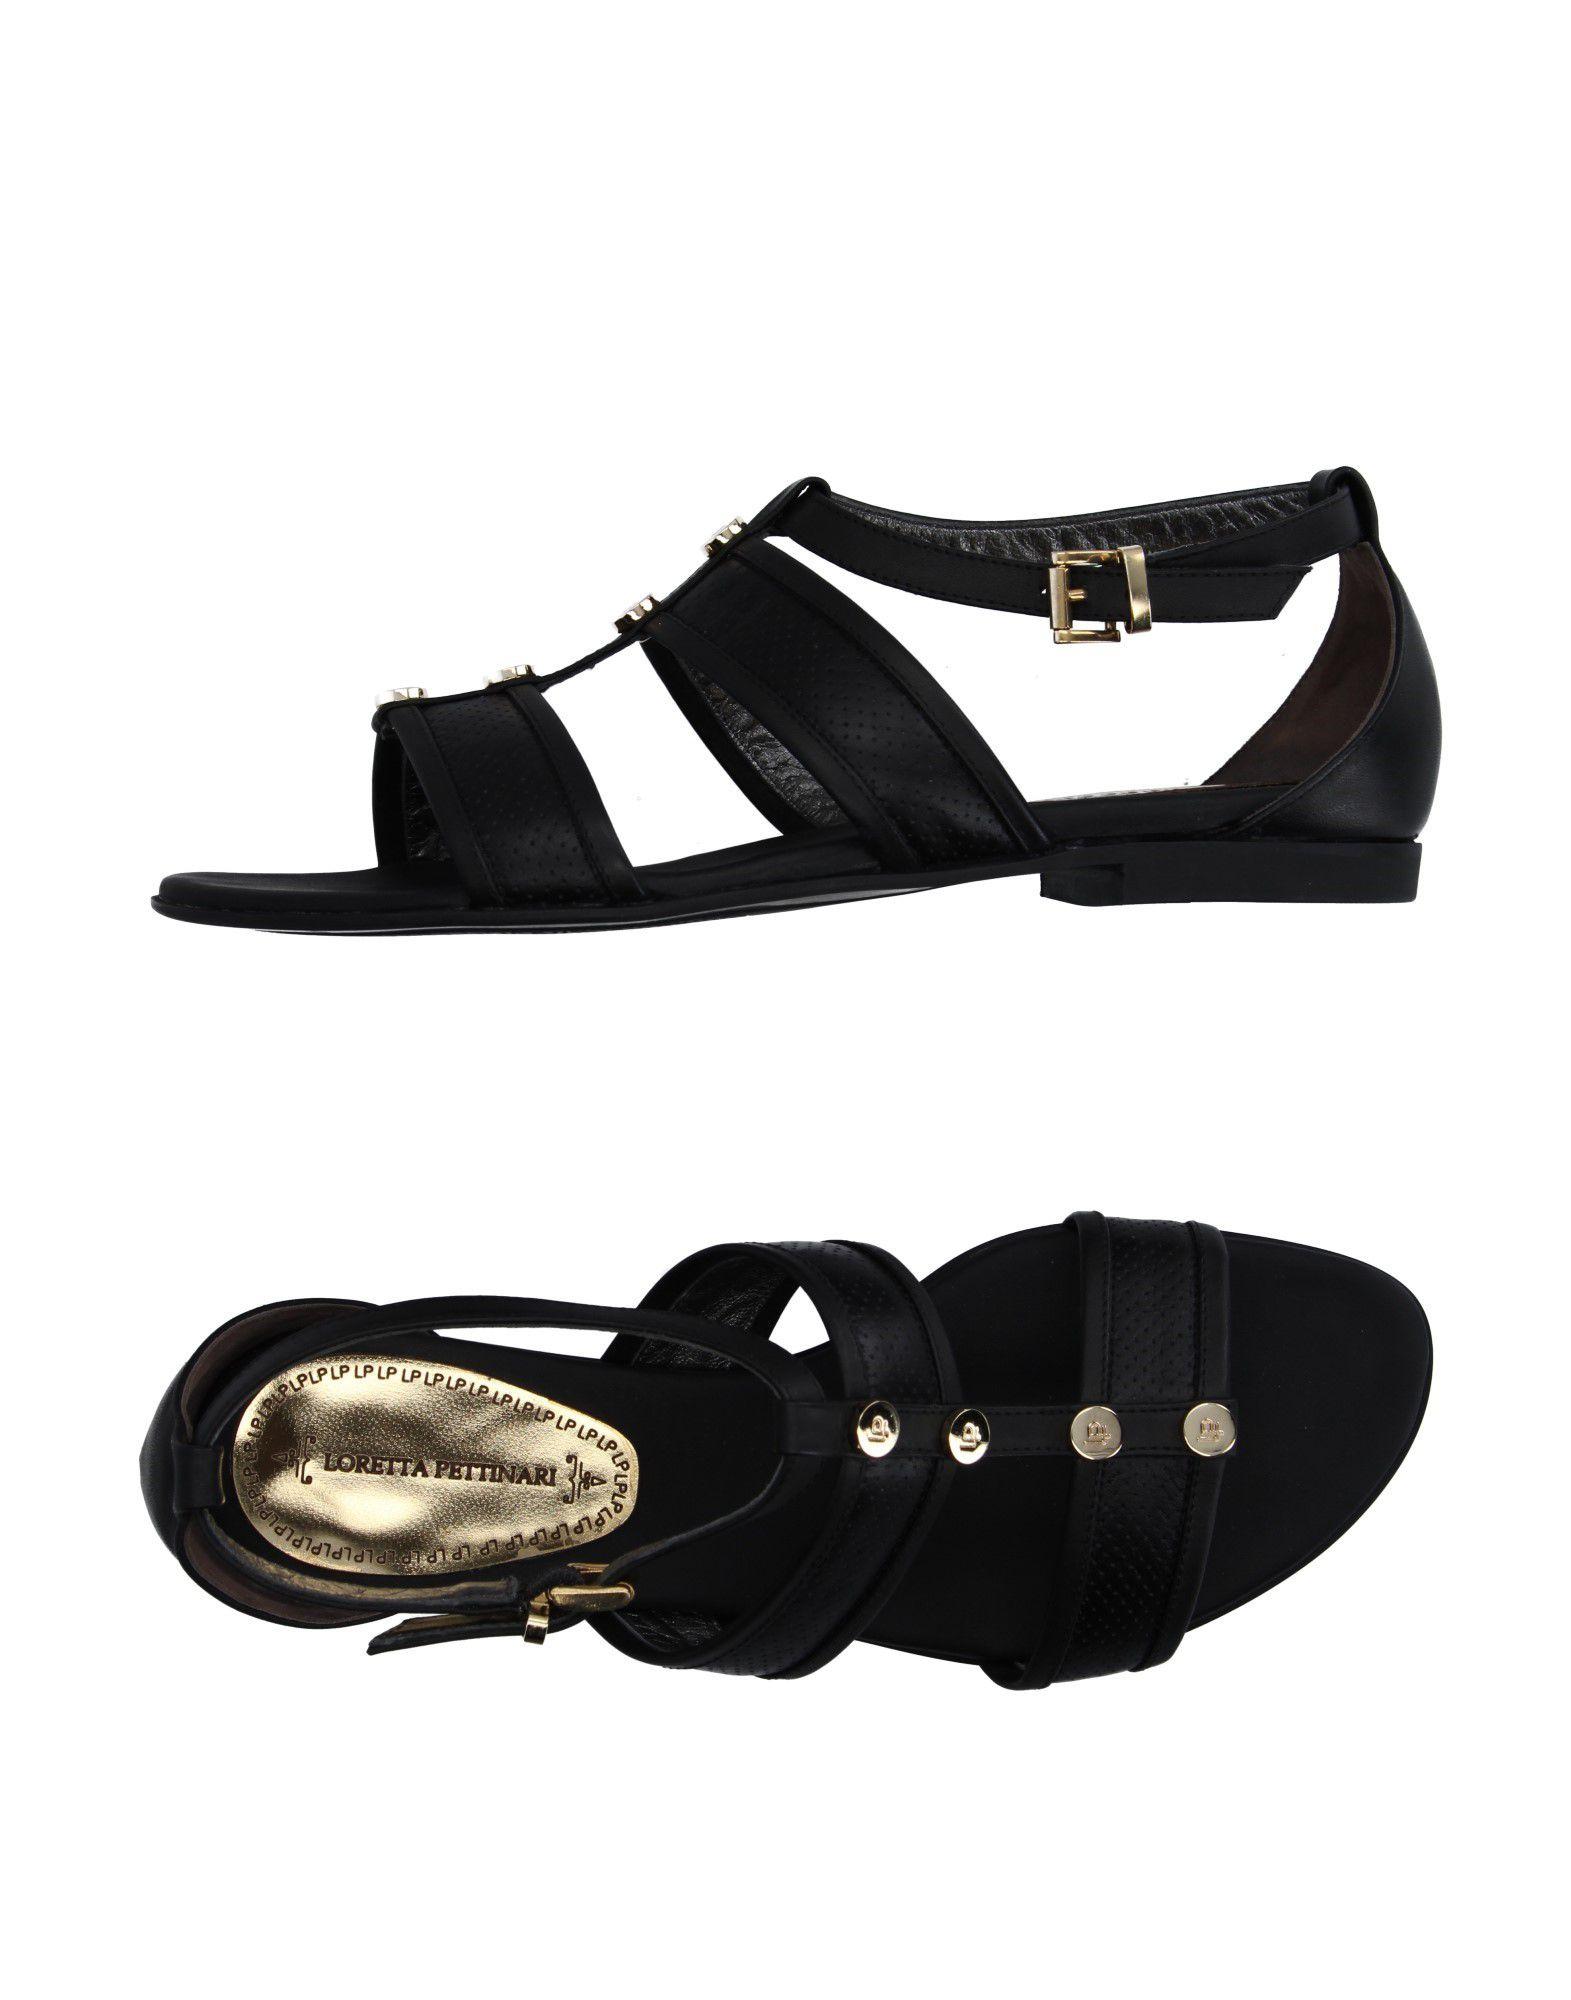 Loretta Pettinari Sandalen Damen  11151483TD Gute Qualität beliebte Schuhe